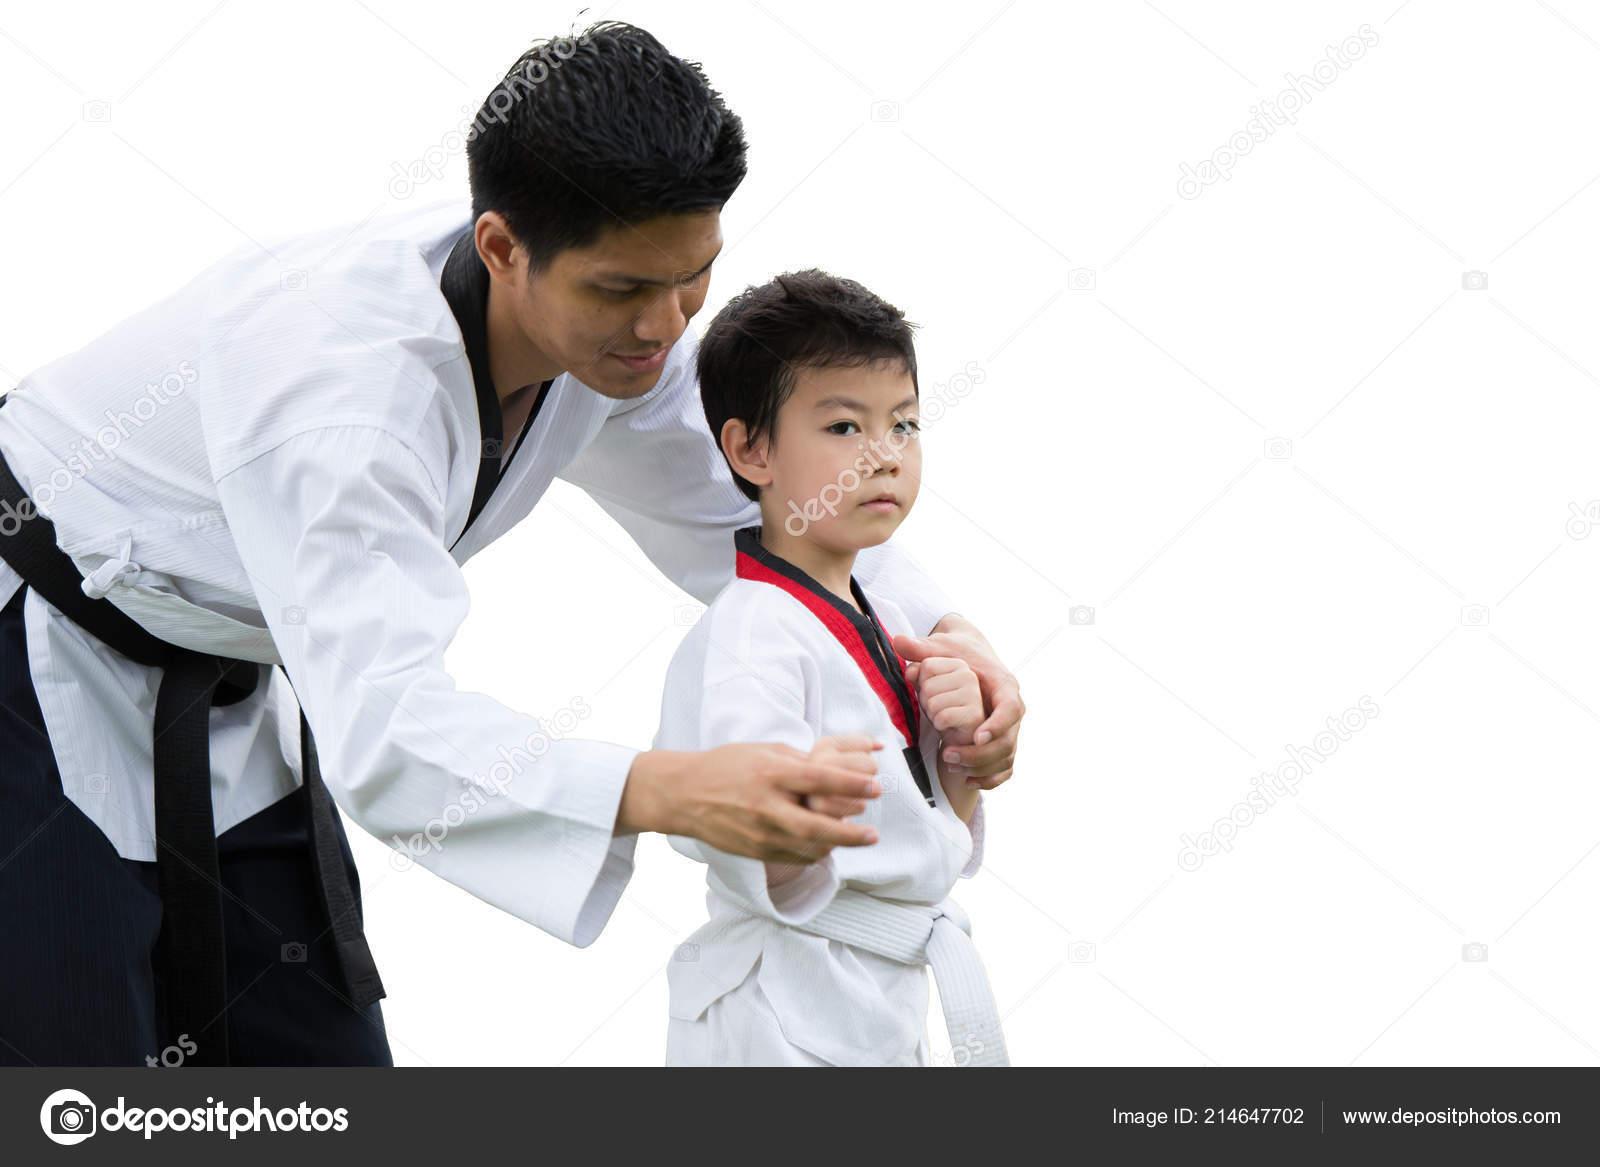 Fekete tini harcol